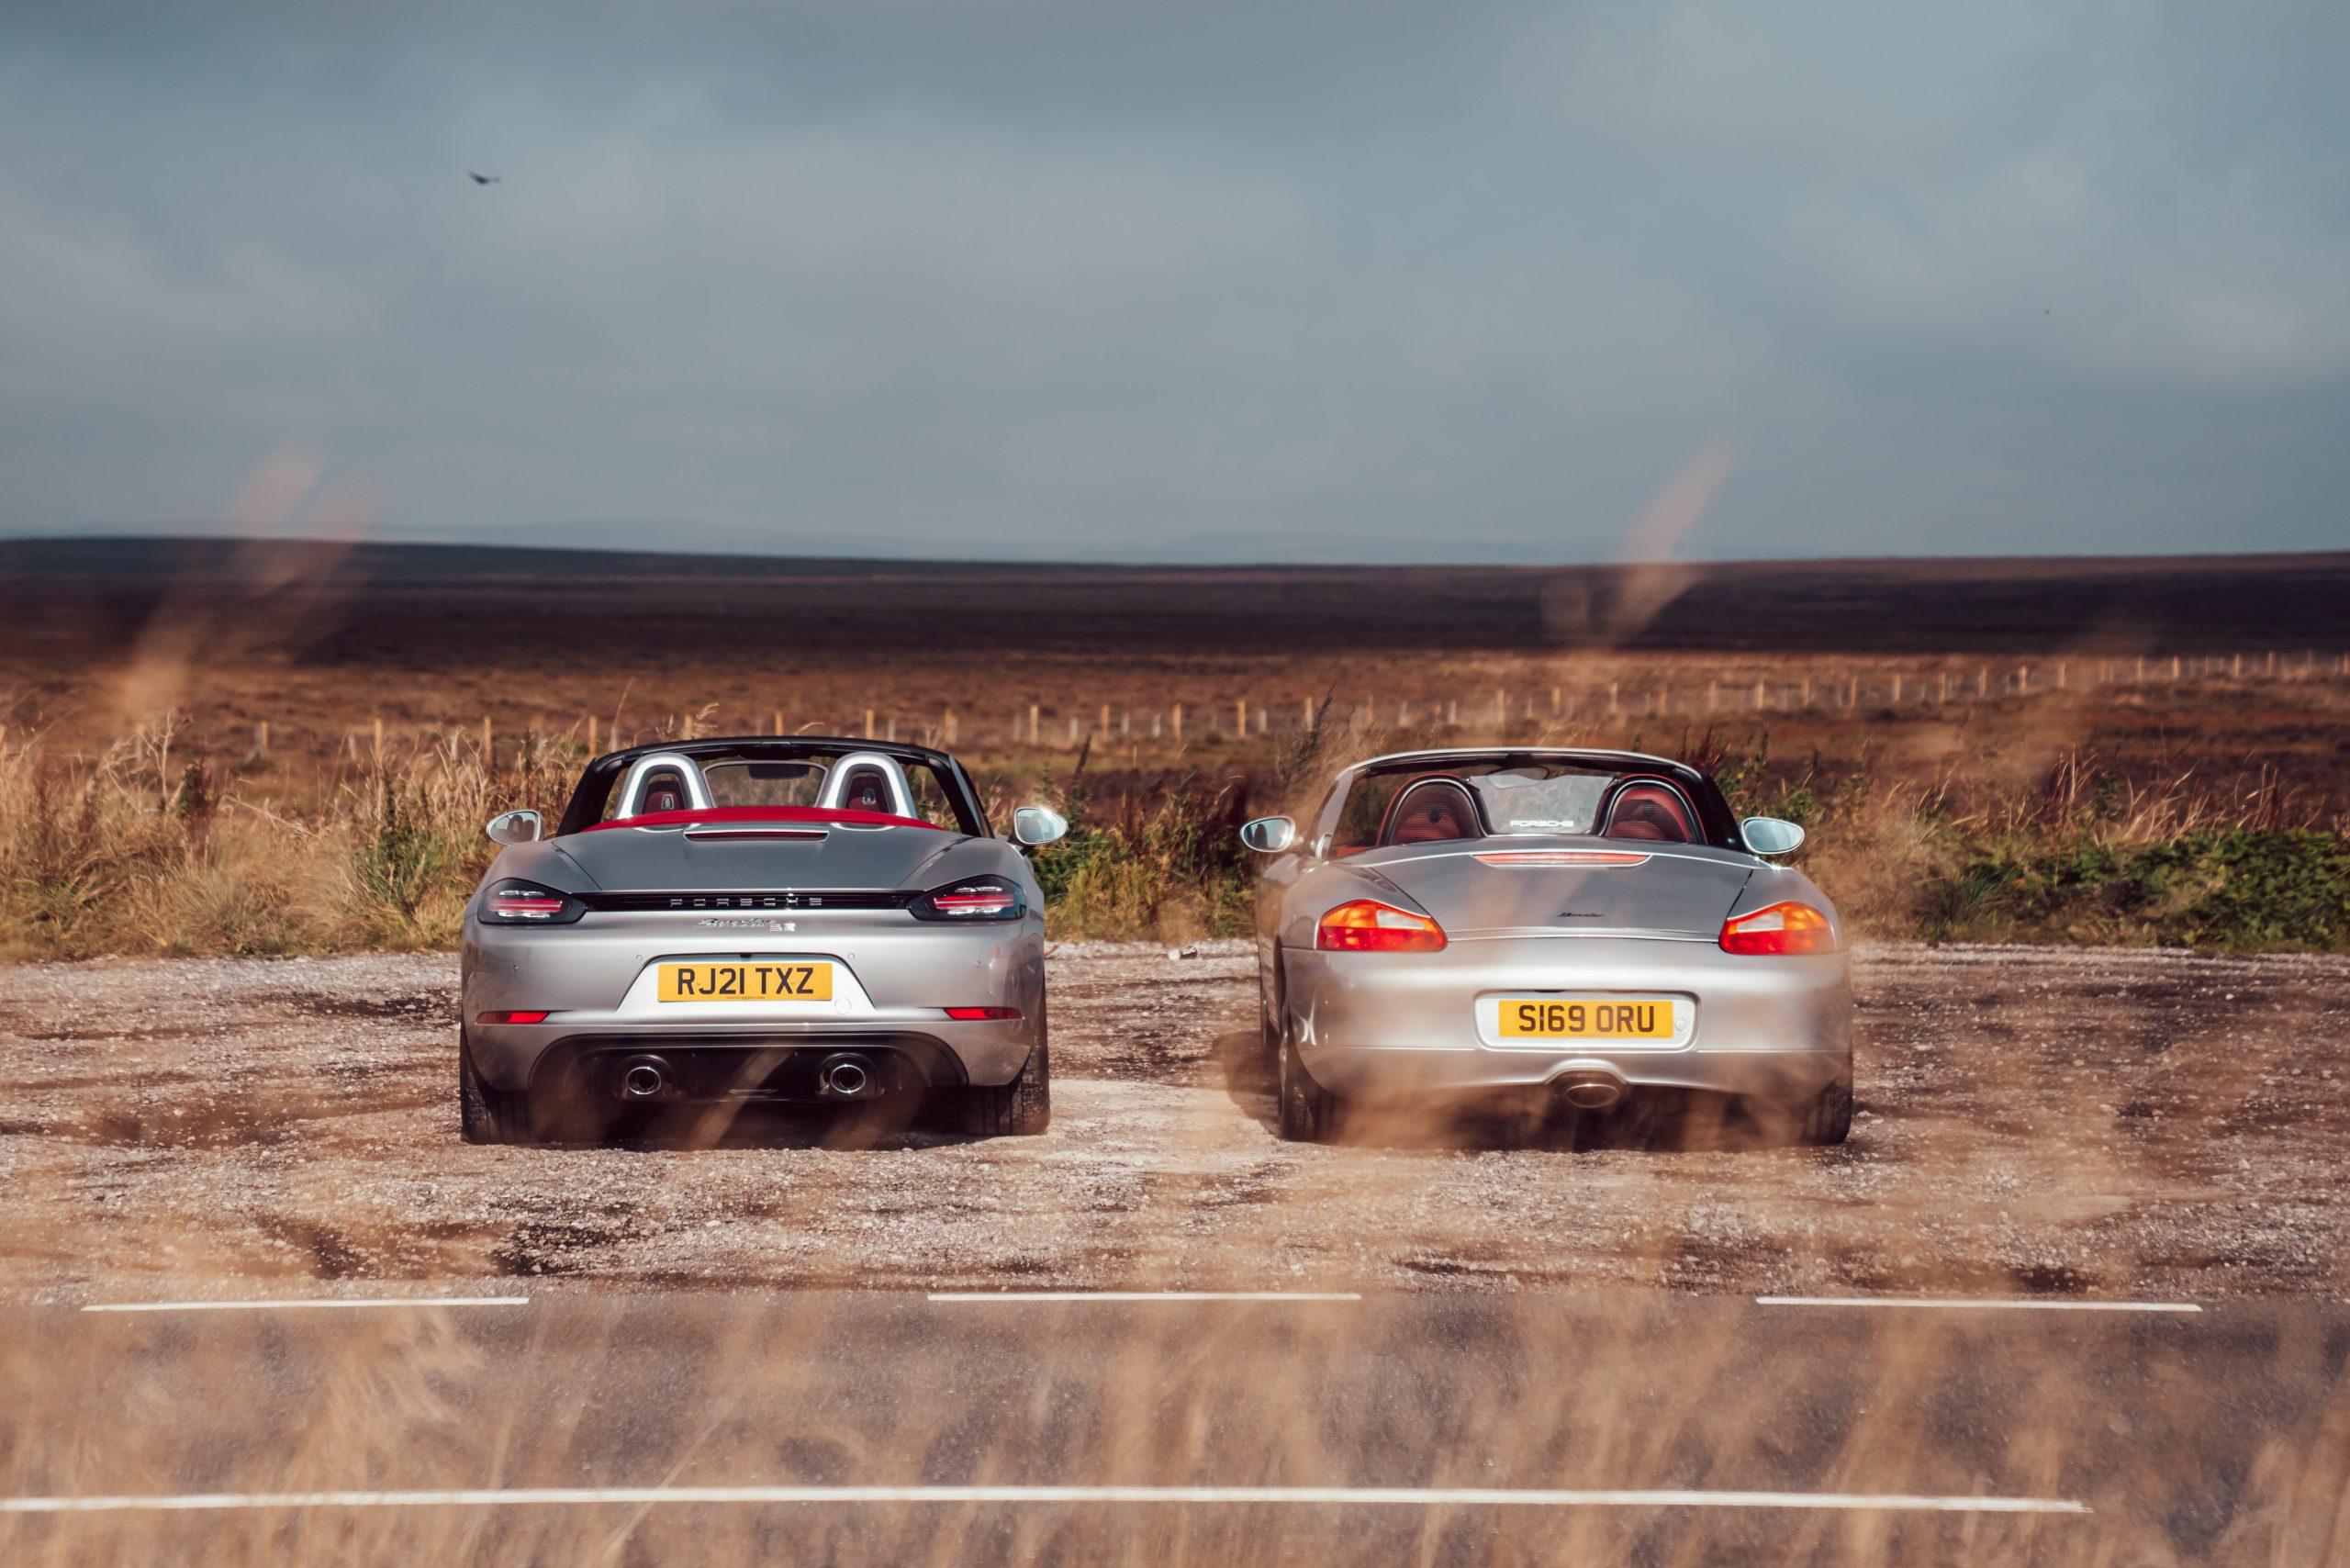 Rear view Porsche Boxsters